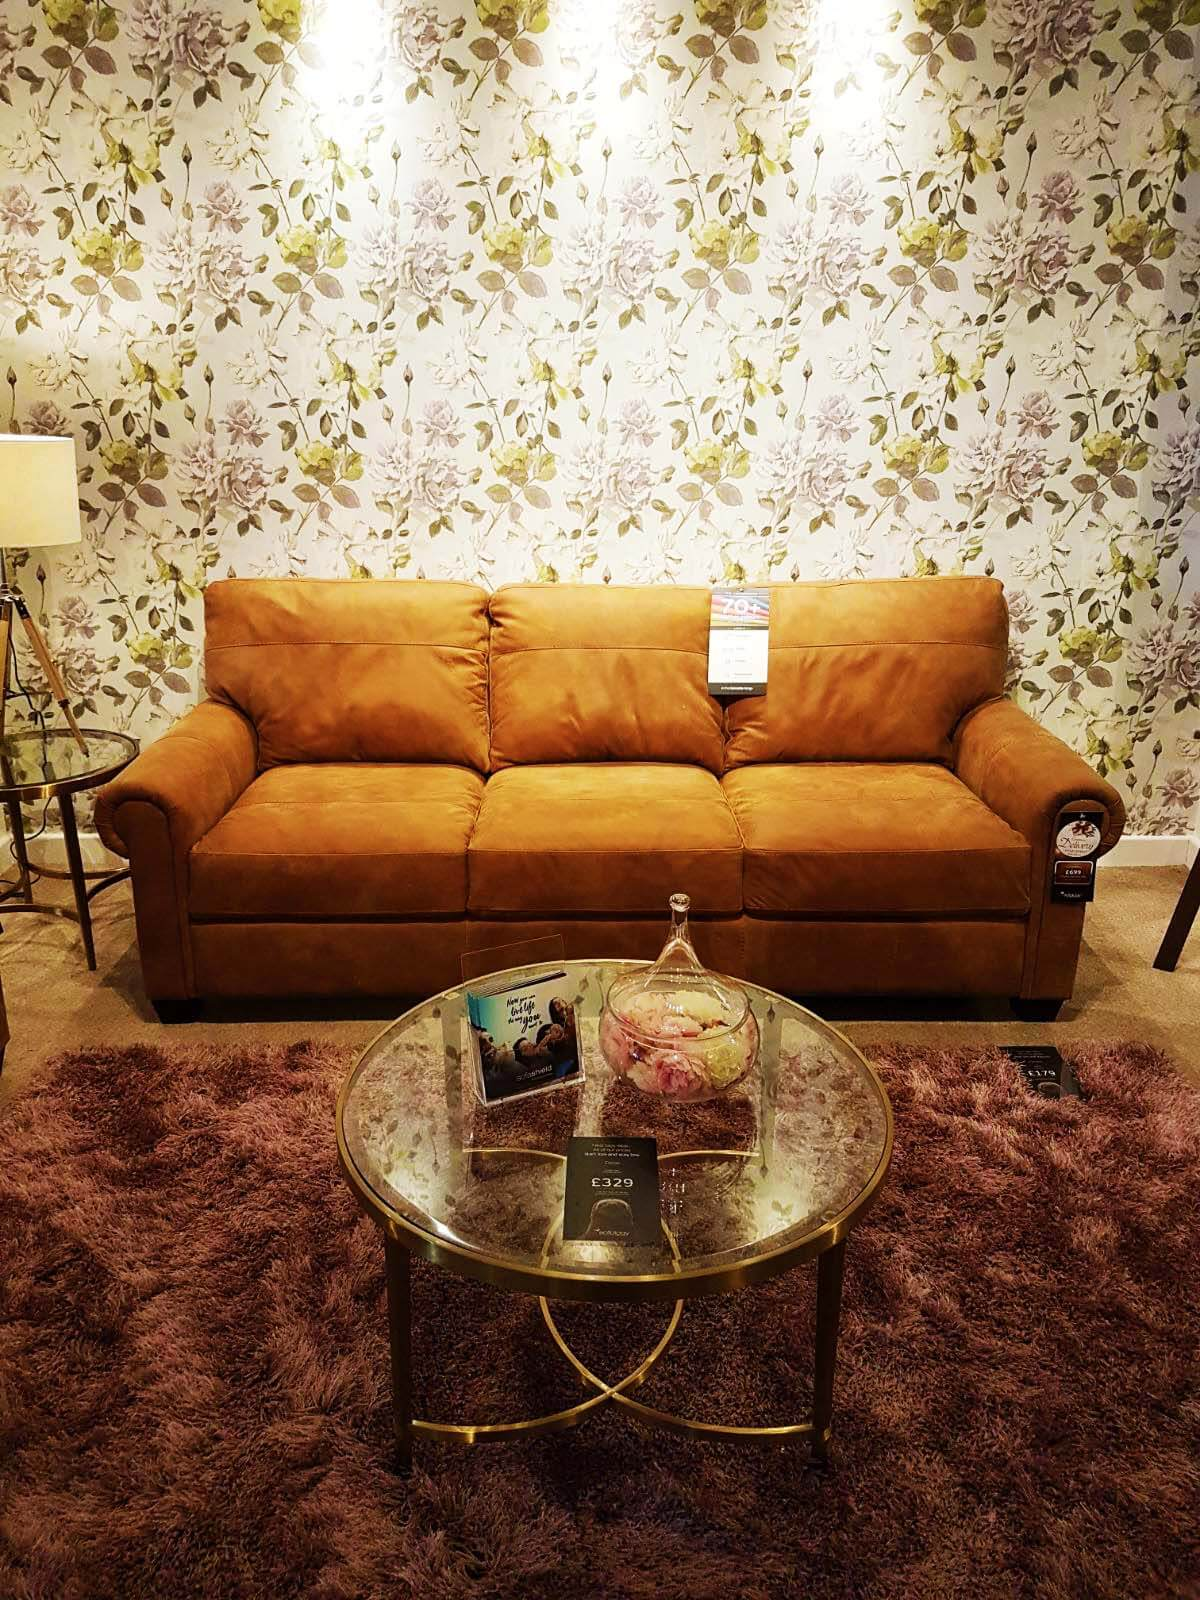 Sofa So Good with Sofology - Concetto sofa